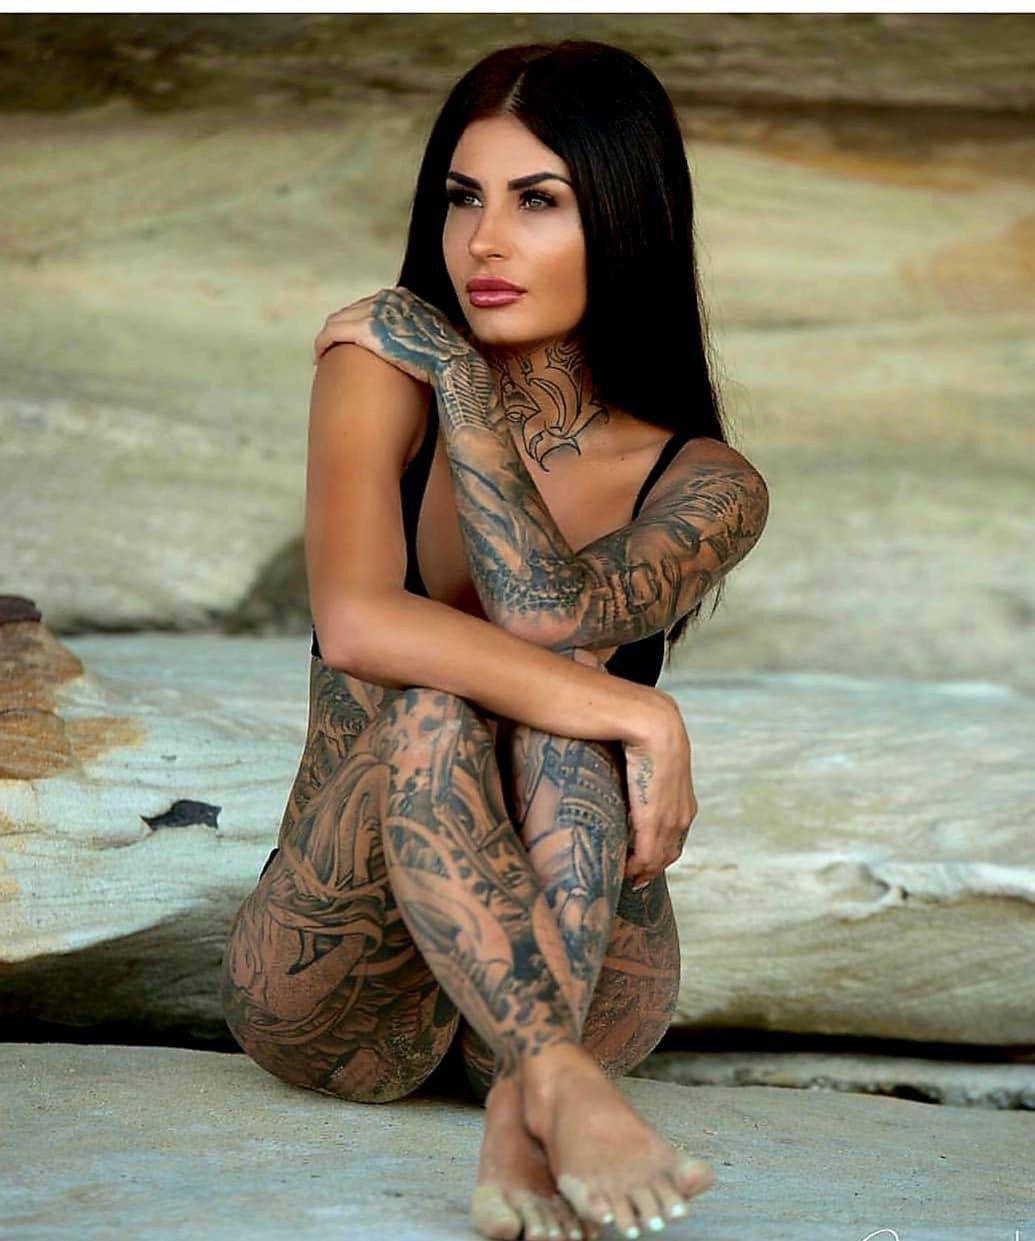 Pin by Loren Beesley on Beautiful | Hot tattoo girls